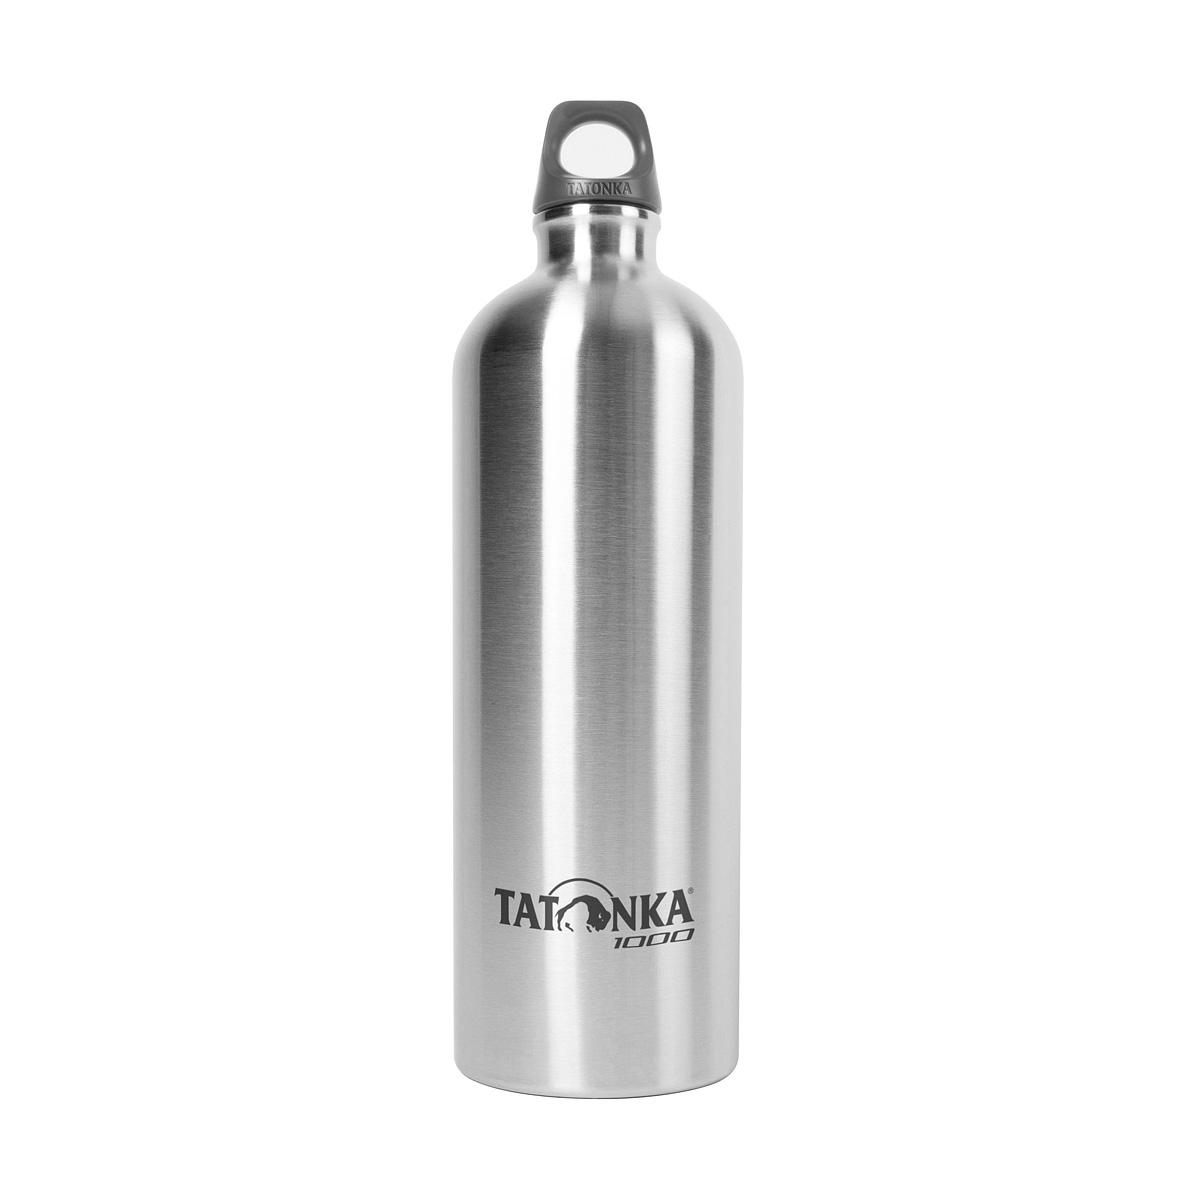 "Tatonka ""Stainless Steel Bottle"" - 1.0l"